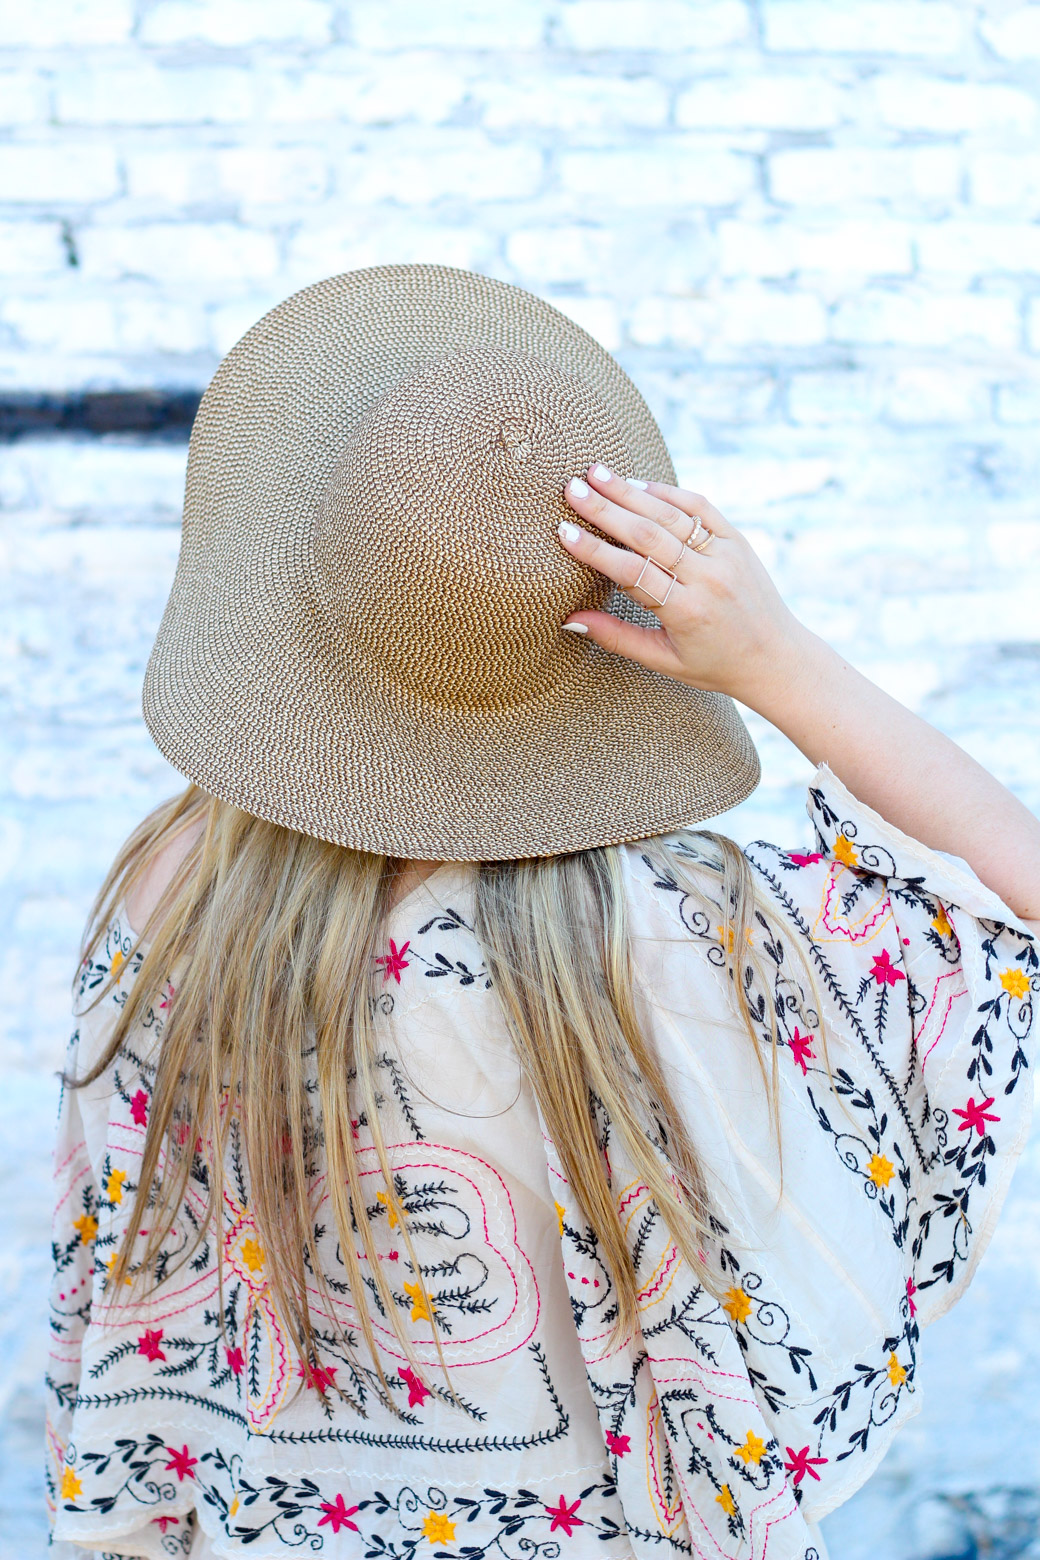 free-people-dress-chicago-fashion-blogger-9